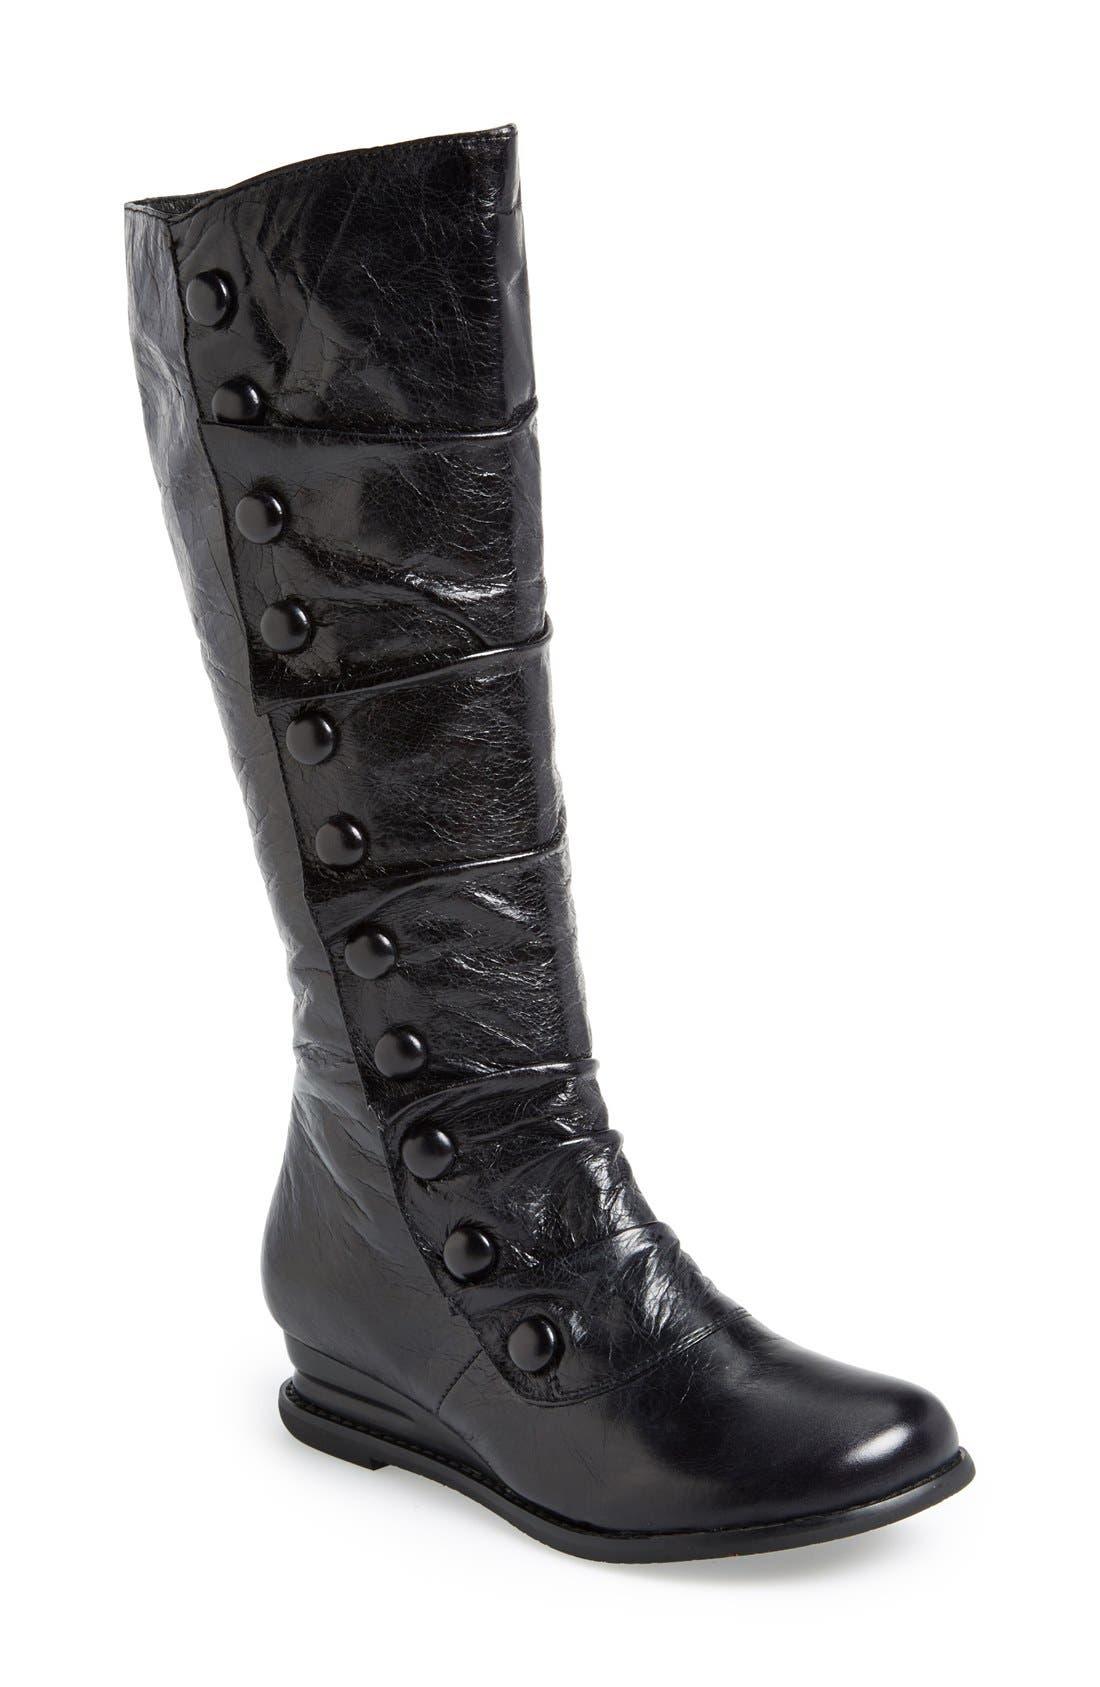 Alternate Image 1 Selected - Miz Mooz 'Bloom' Boot